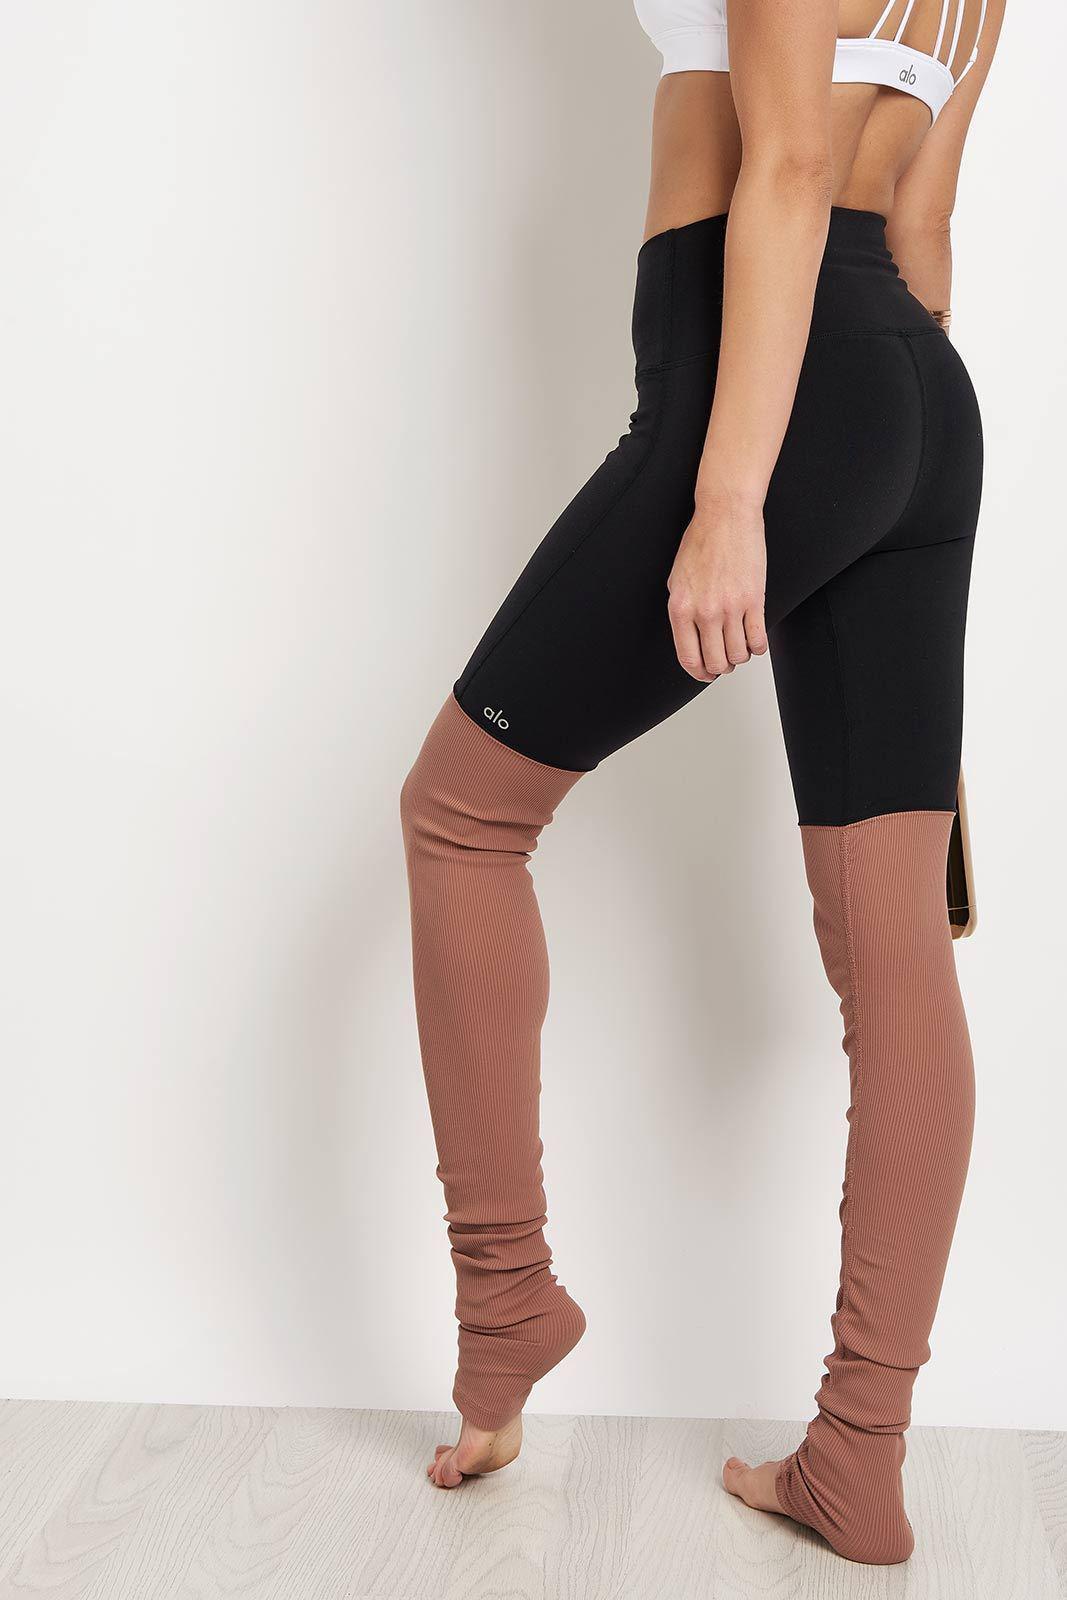 ca7ba56846 Alo Yoga High Waist Goddess Legging in Black - Lyst